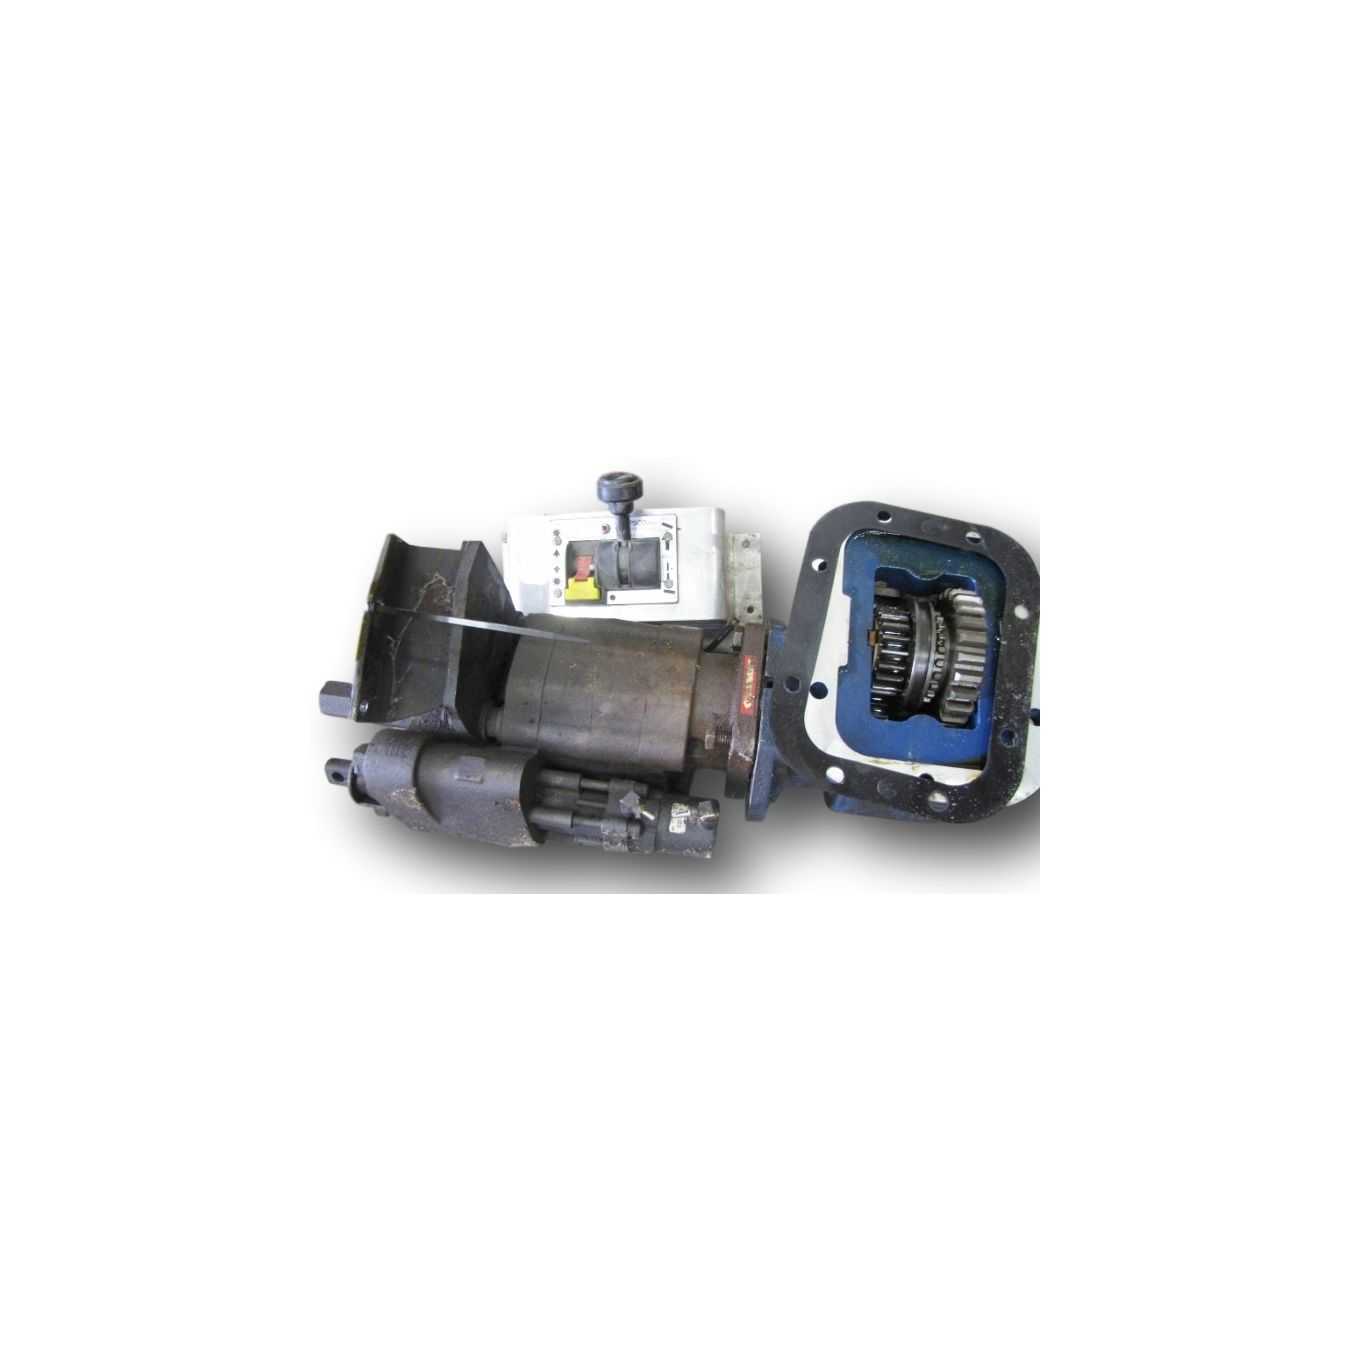 Pump Power Take Off : Used muncie power take off hydraulic pump resevoir